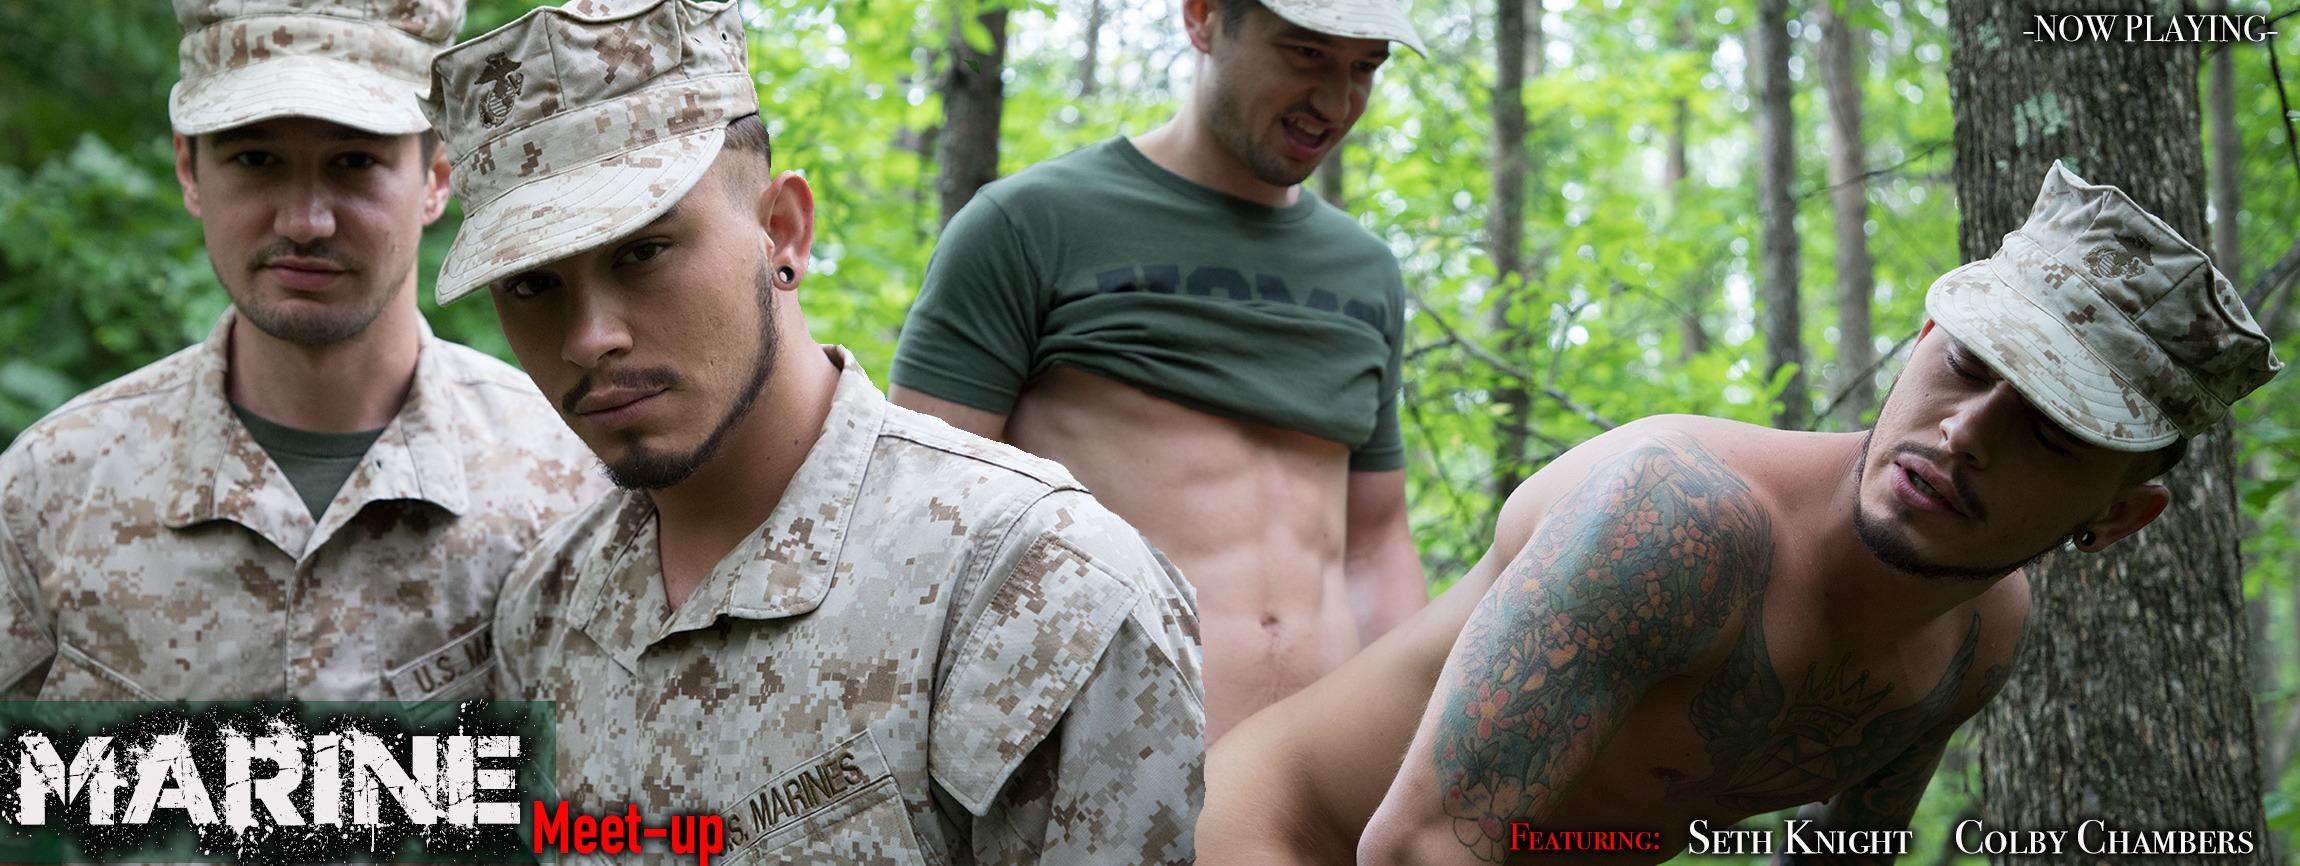 Marine Meetup